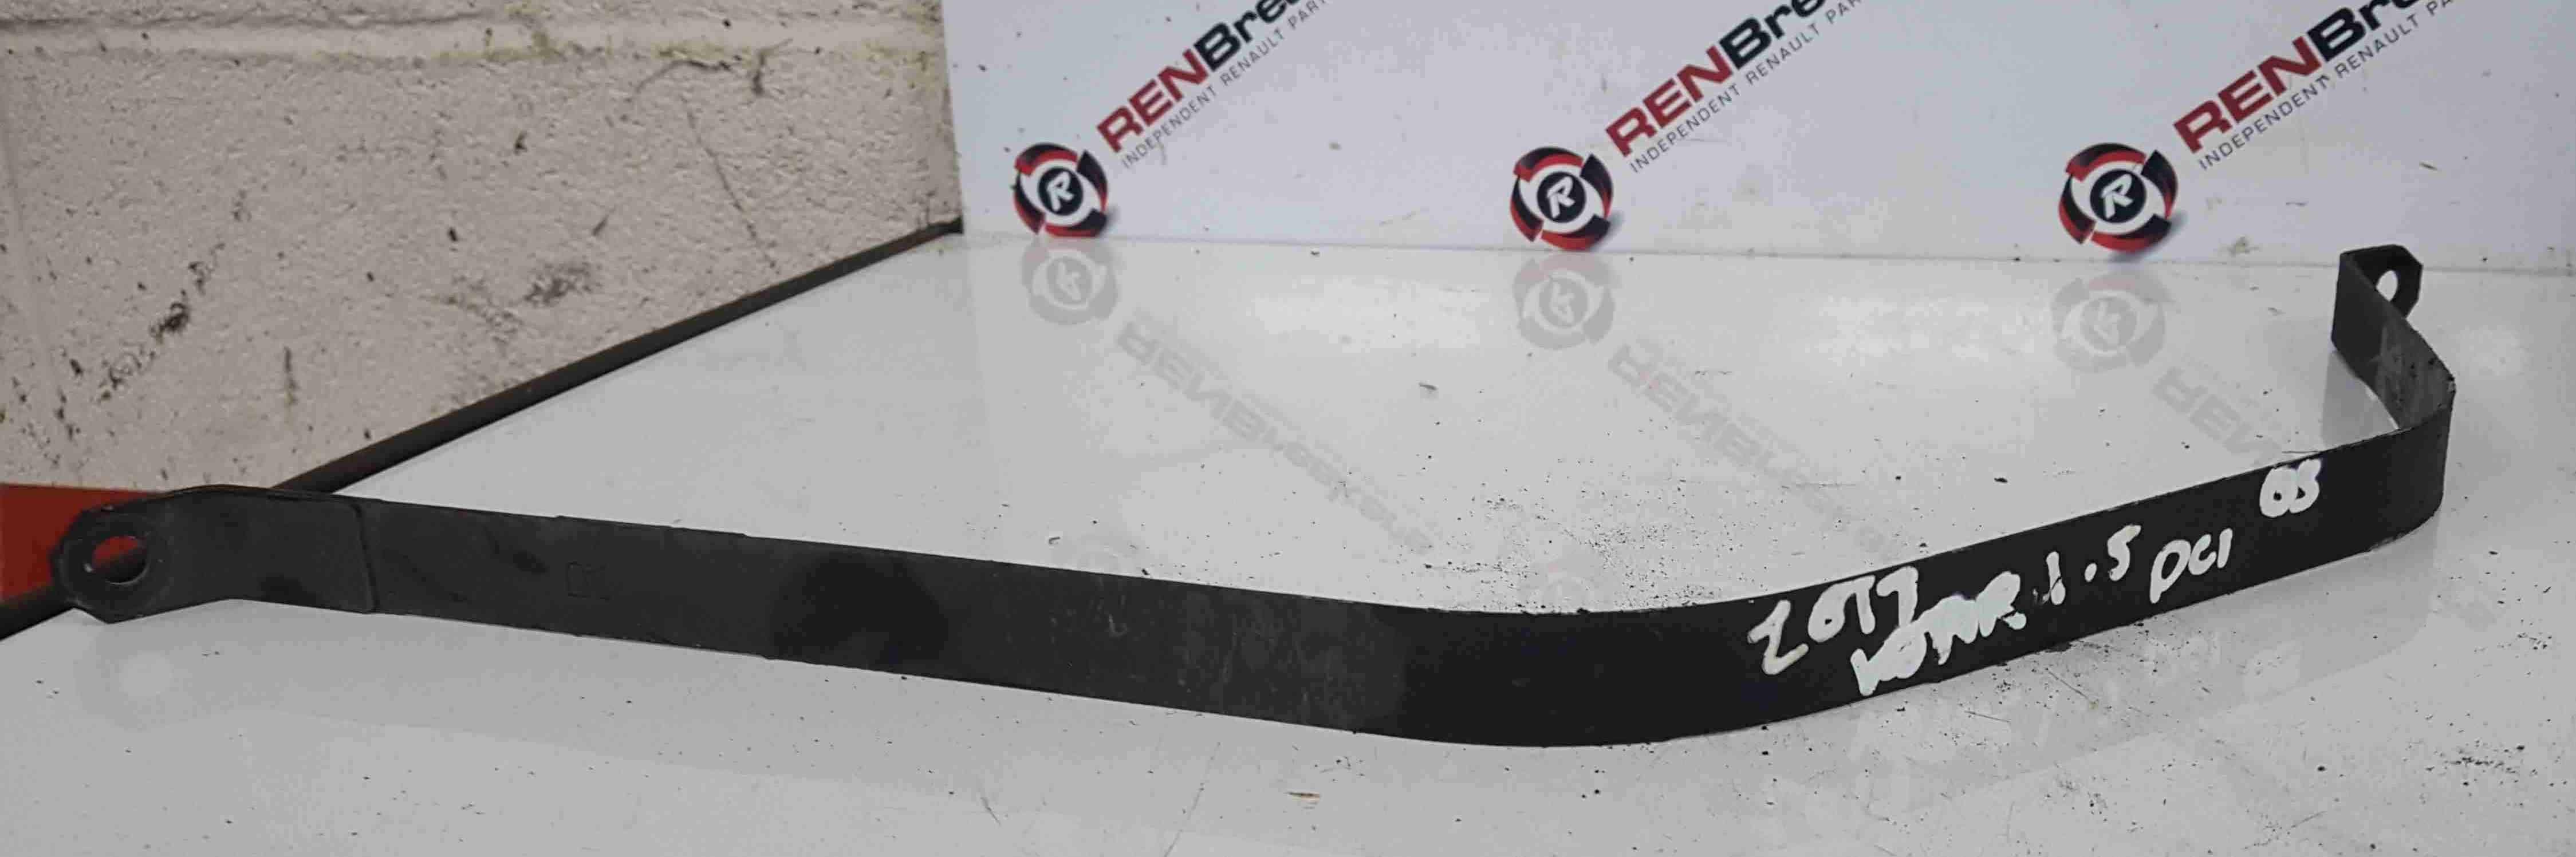 Renault Kadjar 2015-2021 Drivers OS Fuel Tank Strap